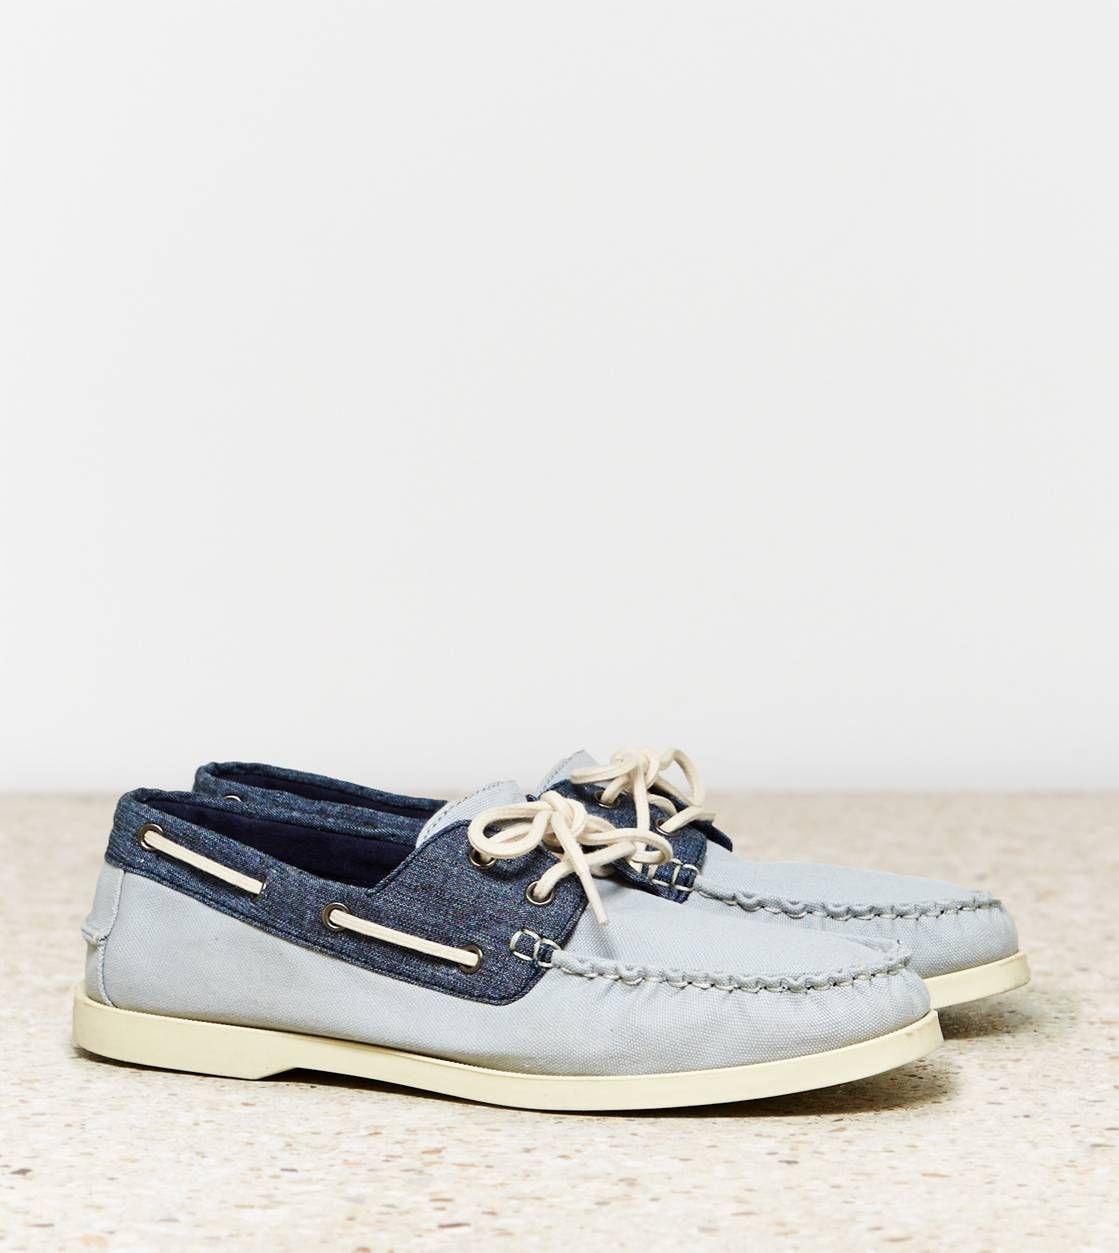 Grey AEO Canvas Boat Shoe